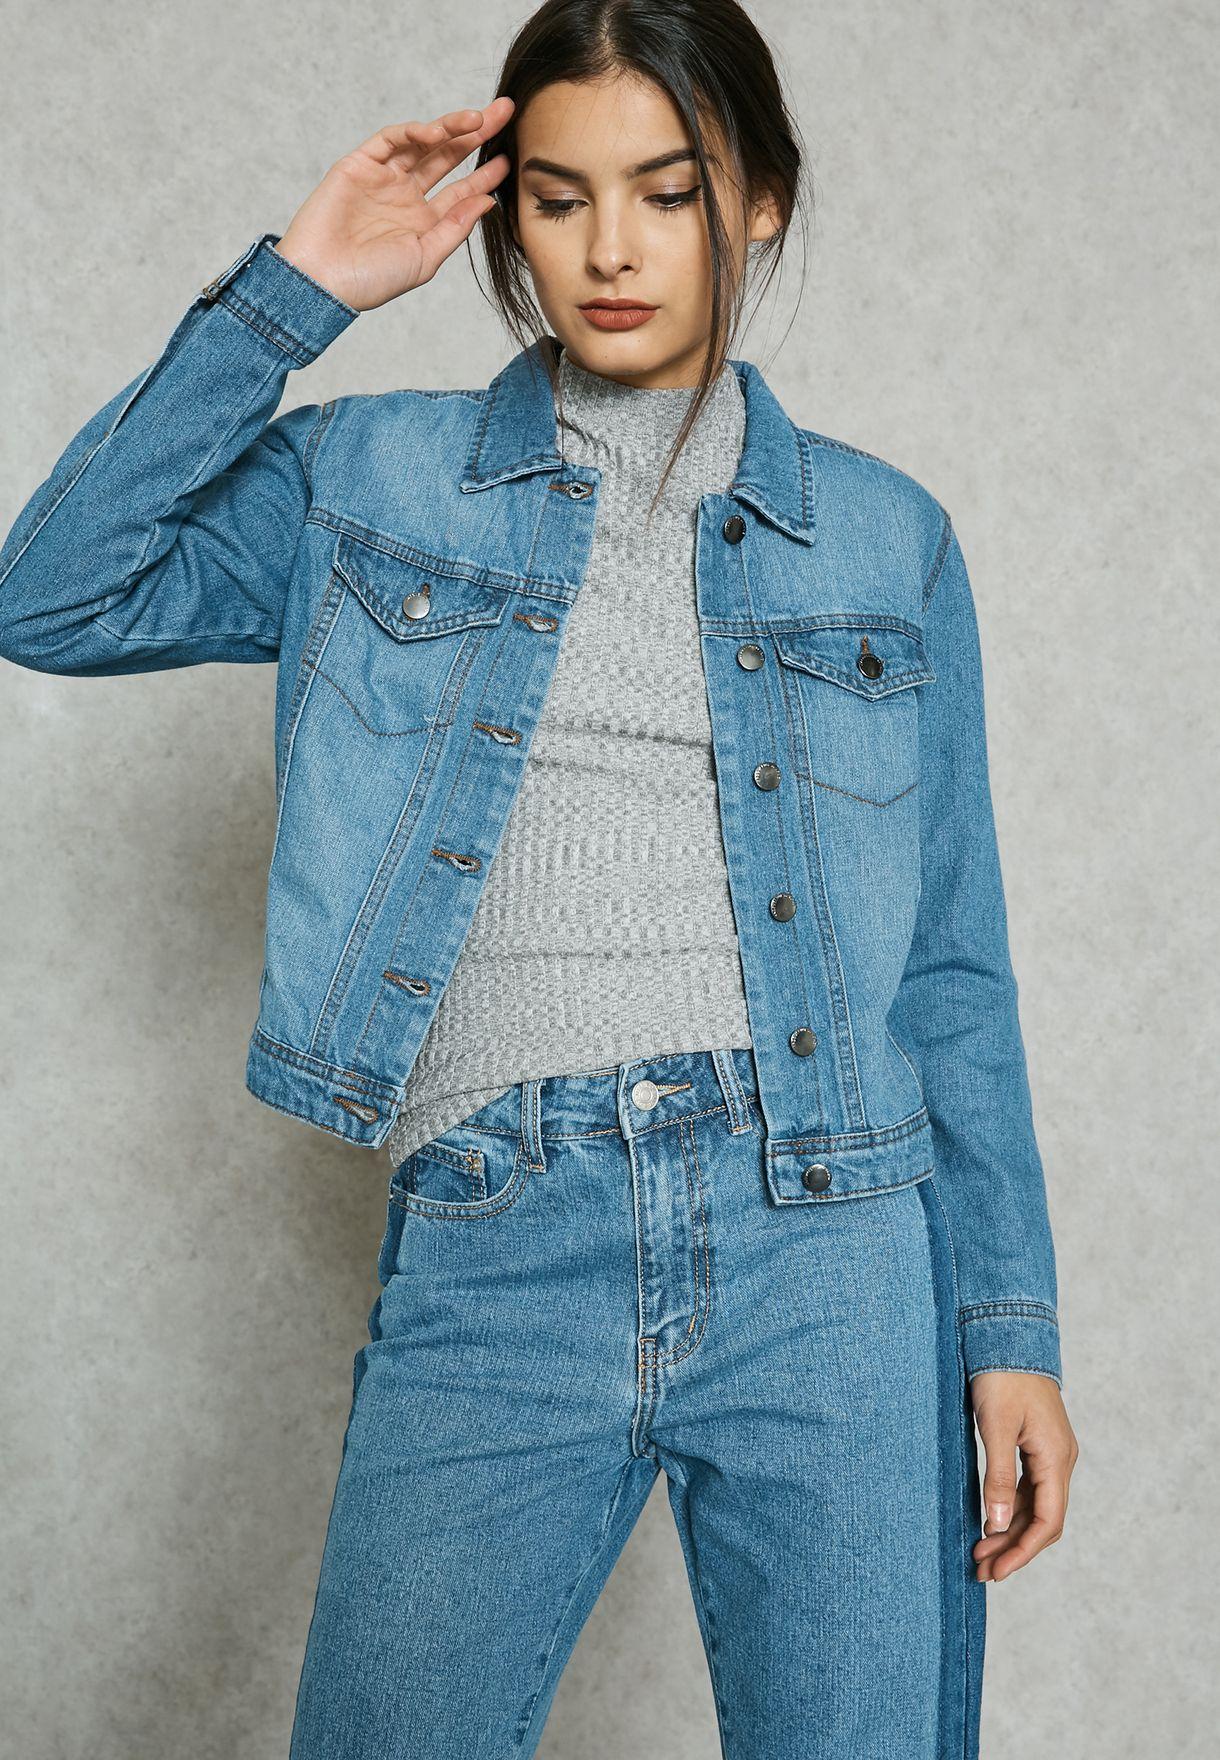 87f37c352 تسوق جاكيت جينز ماركة جاكلين دي يونج لون أزرق 15129781 في السعودية ...